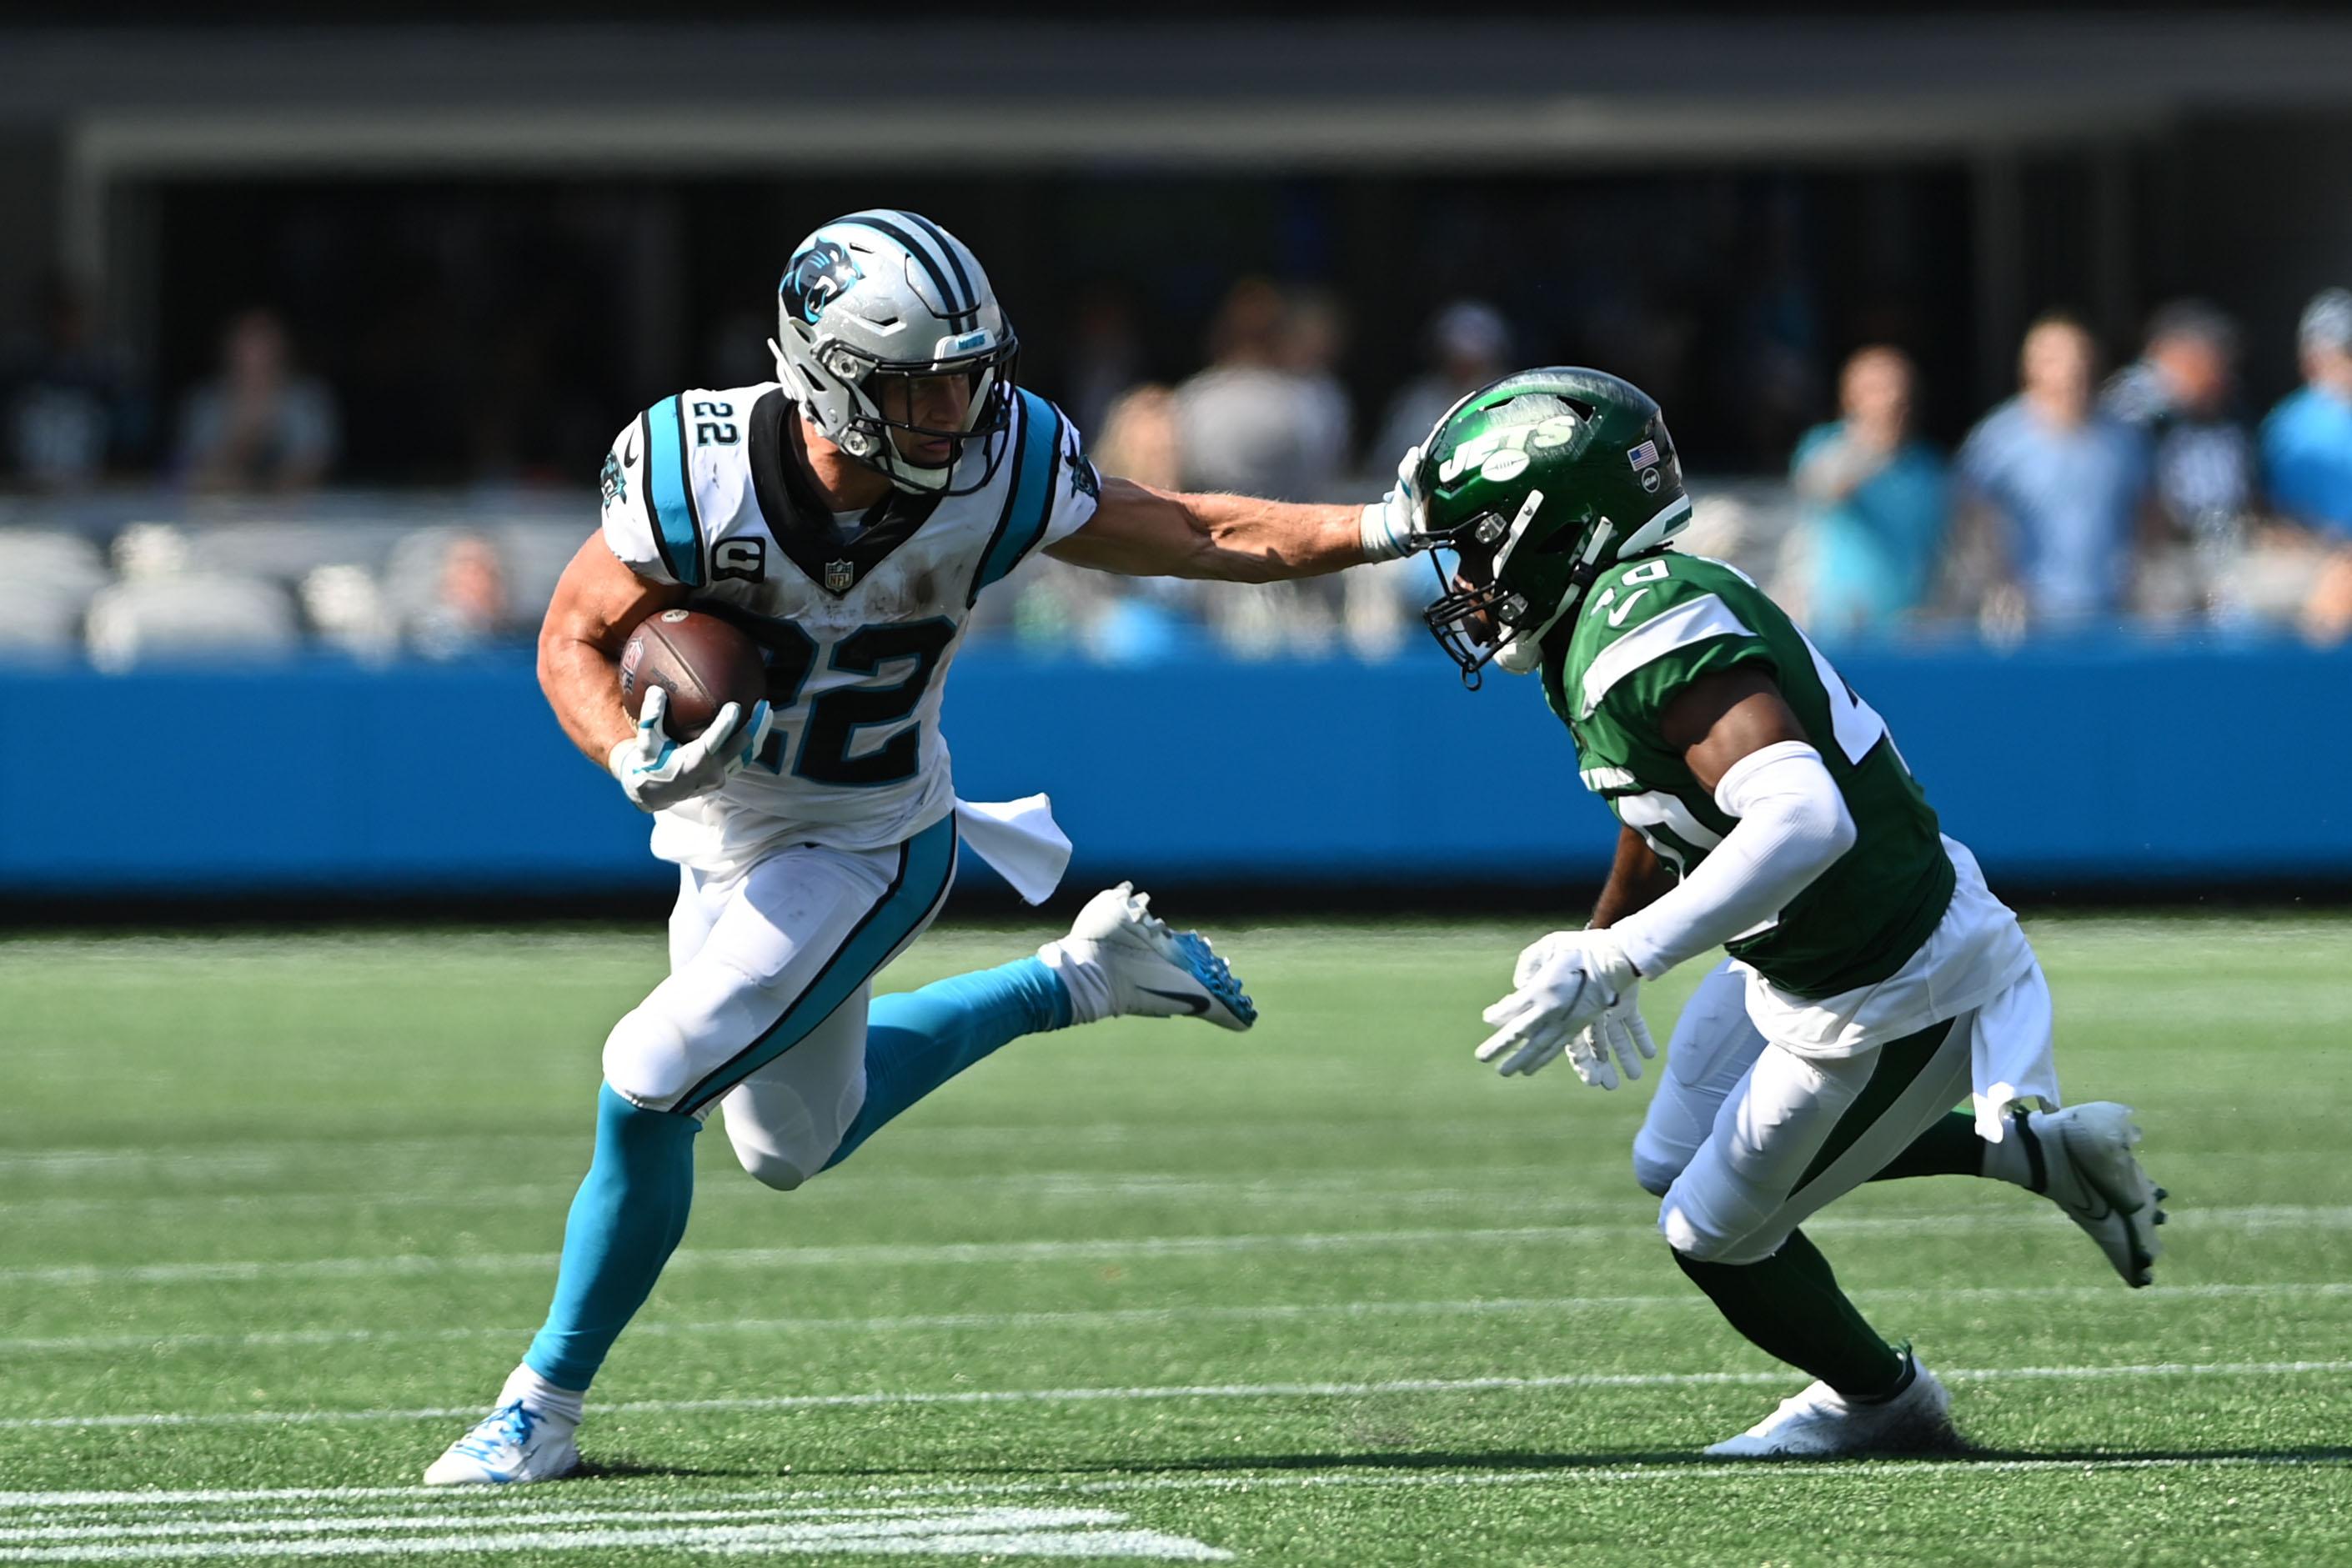 NFL: New York Jets at Carolina Panthers